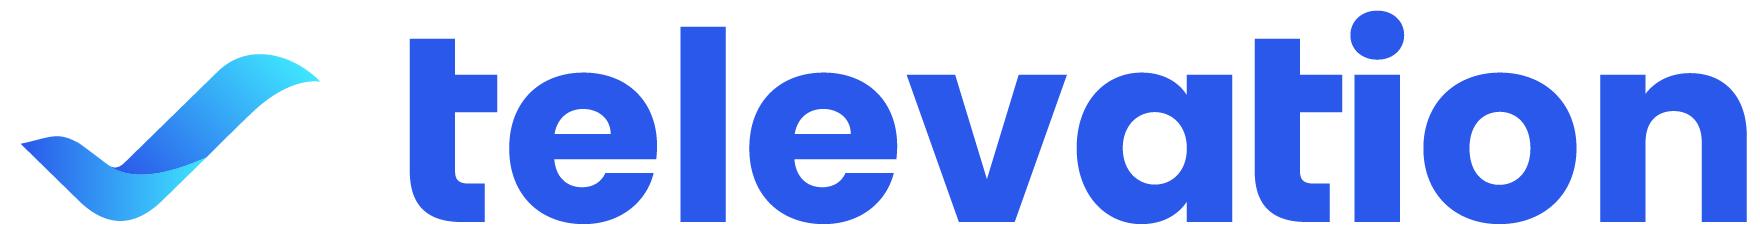 Televation